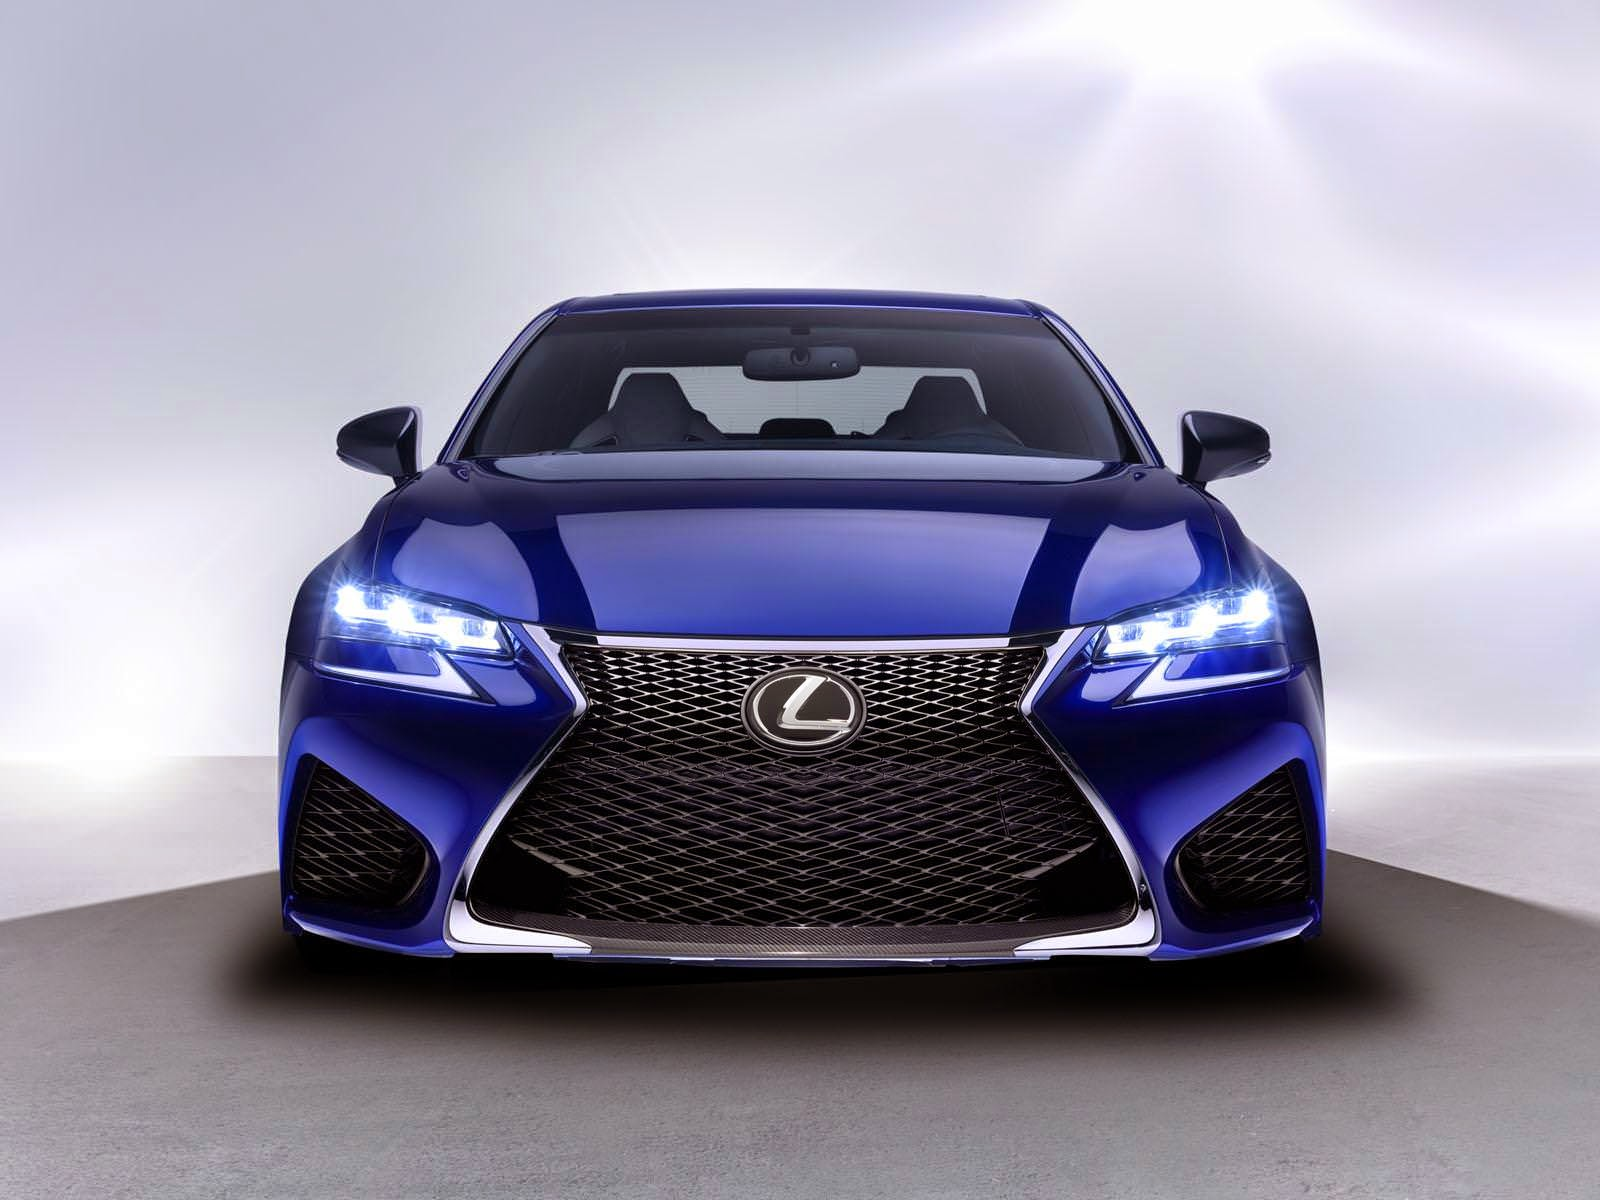 Lexus GS F صور سيارات: سيارة الرياضية لكزس جي اس اف 2016